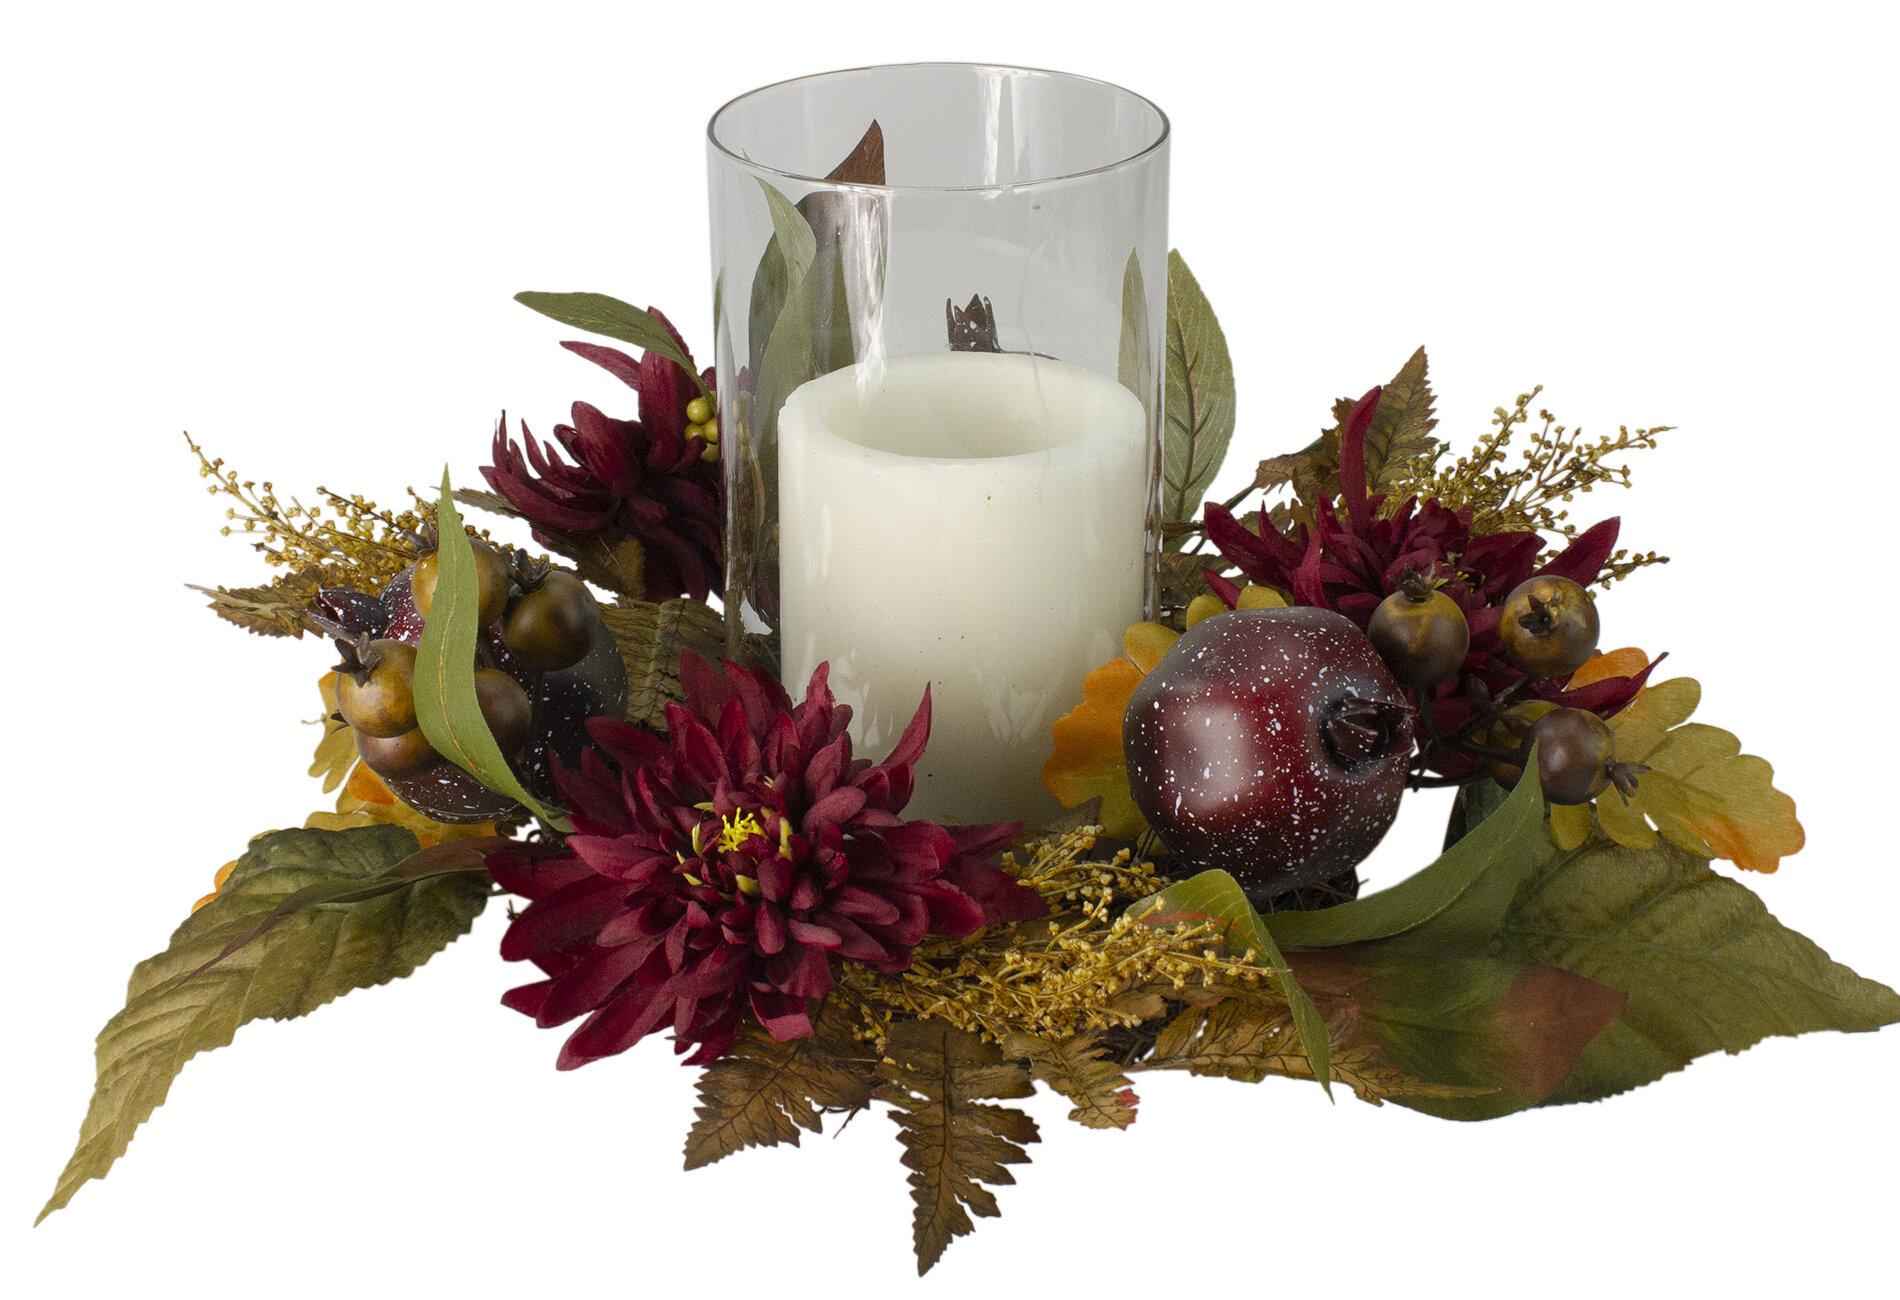 Northlight 22 Autumn Harvest Mums With Pomegranate Autumn Centerpiece Glass Candle Holder Wayfair